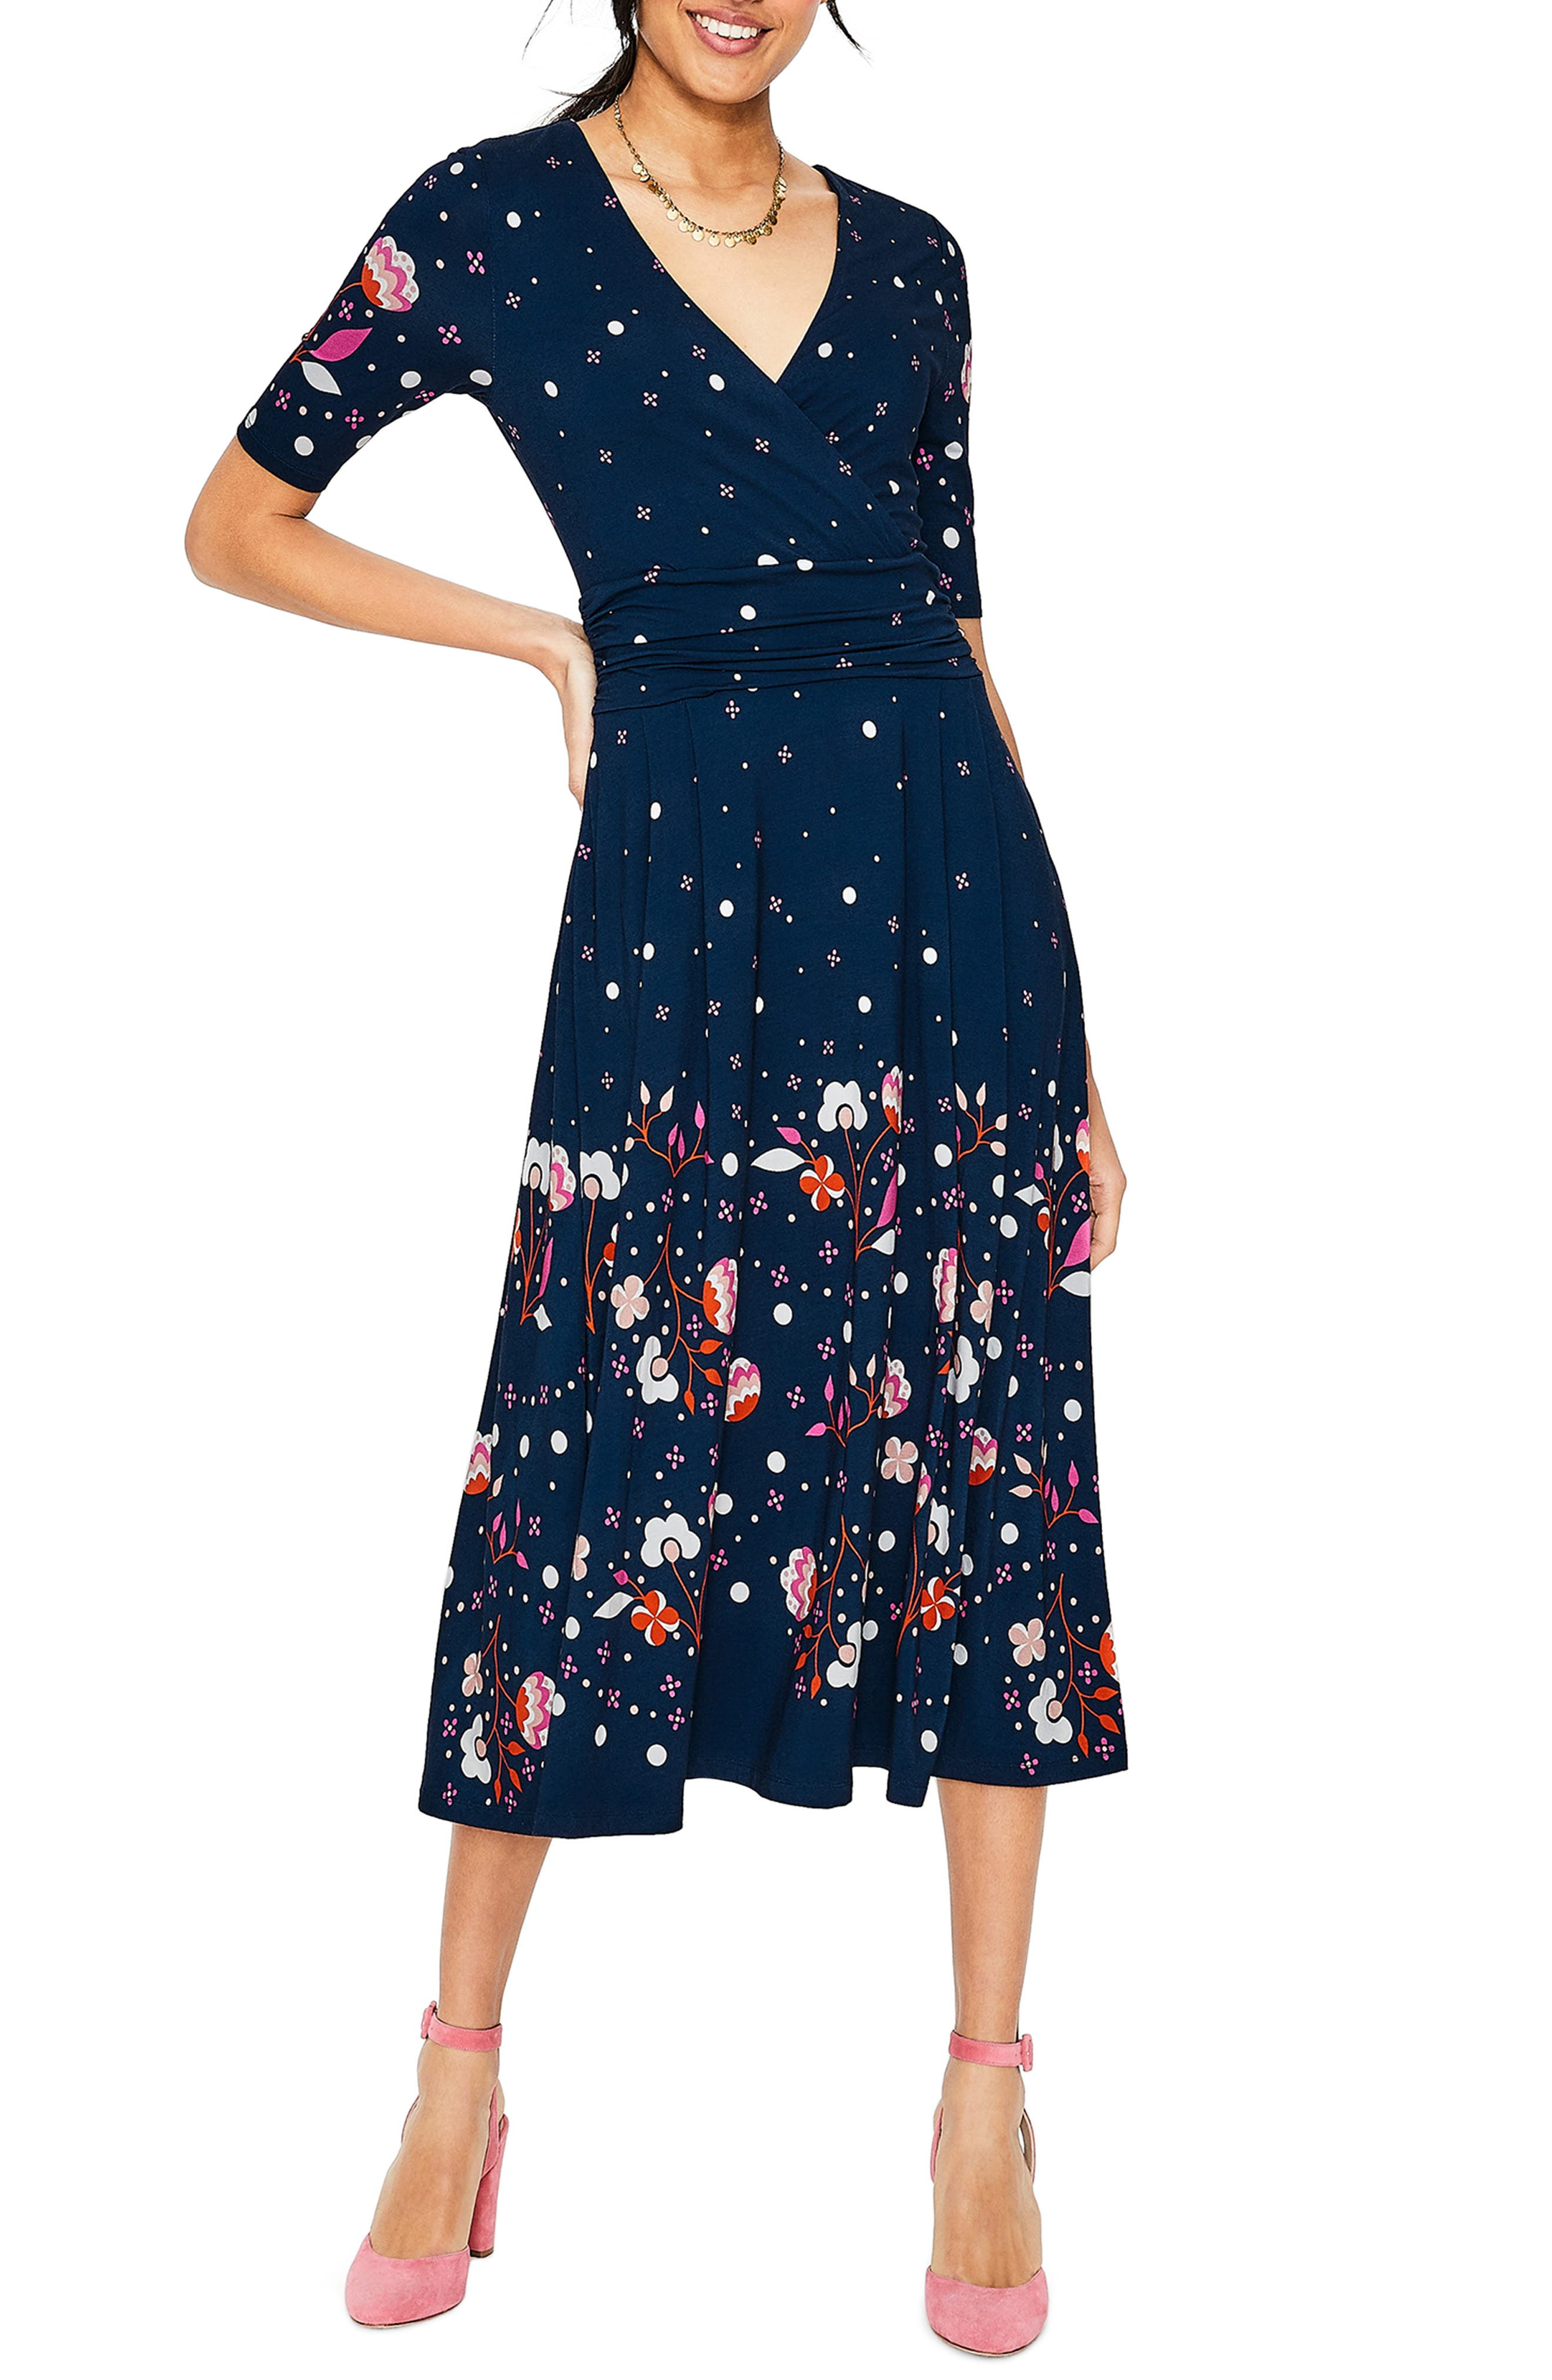 Boden Cassidy Faux Wrap Jersey Dress